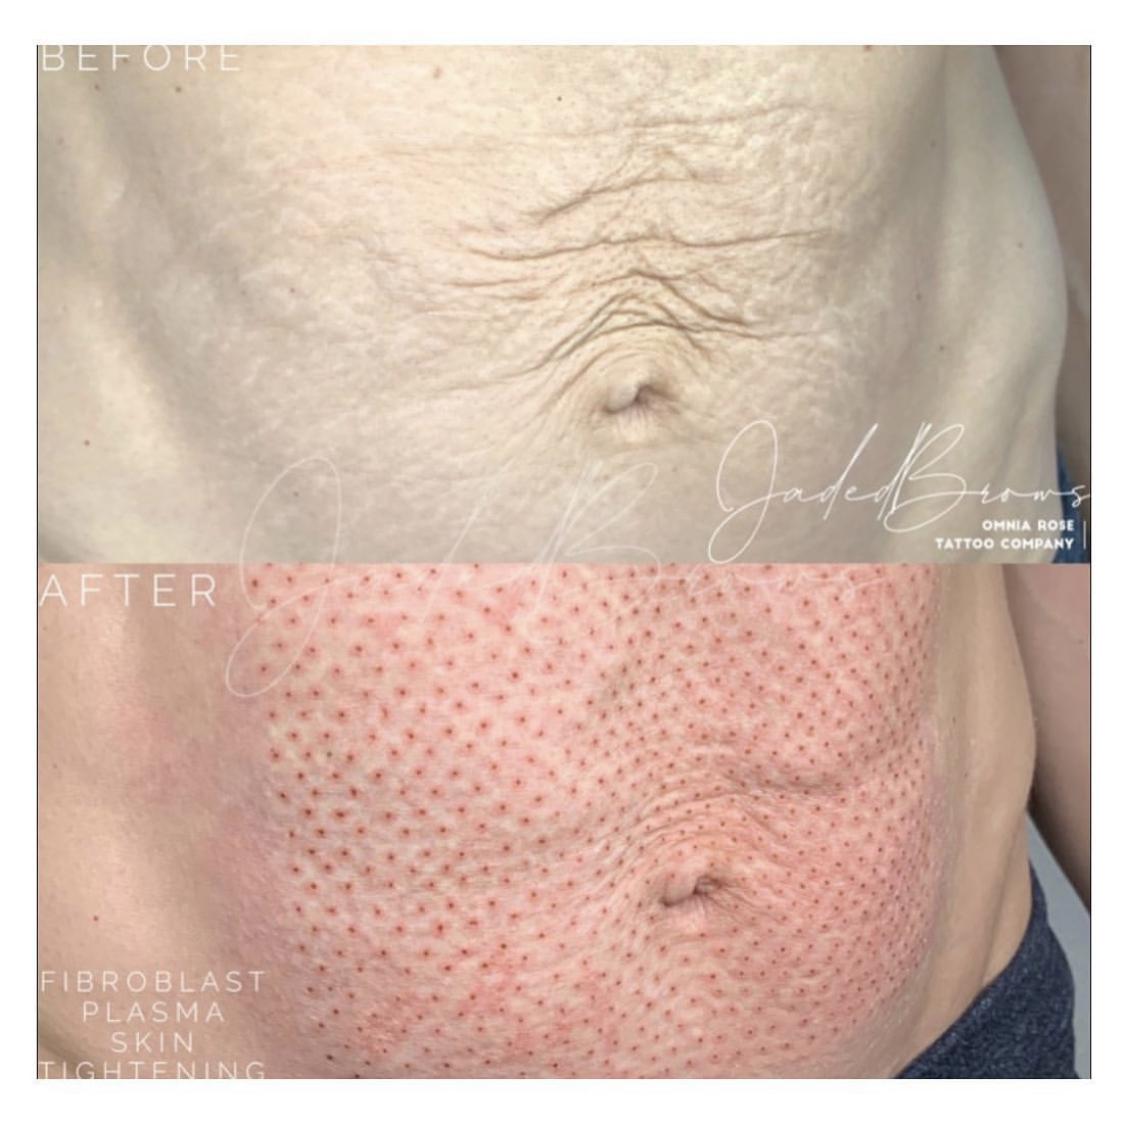 Fibroblast stomach